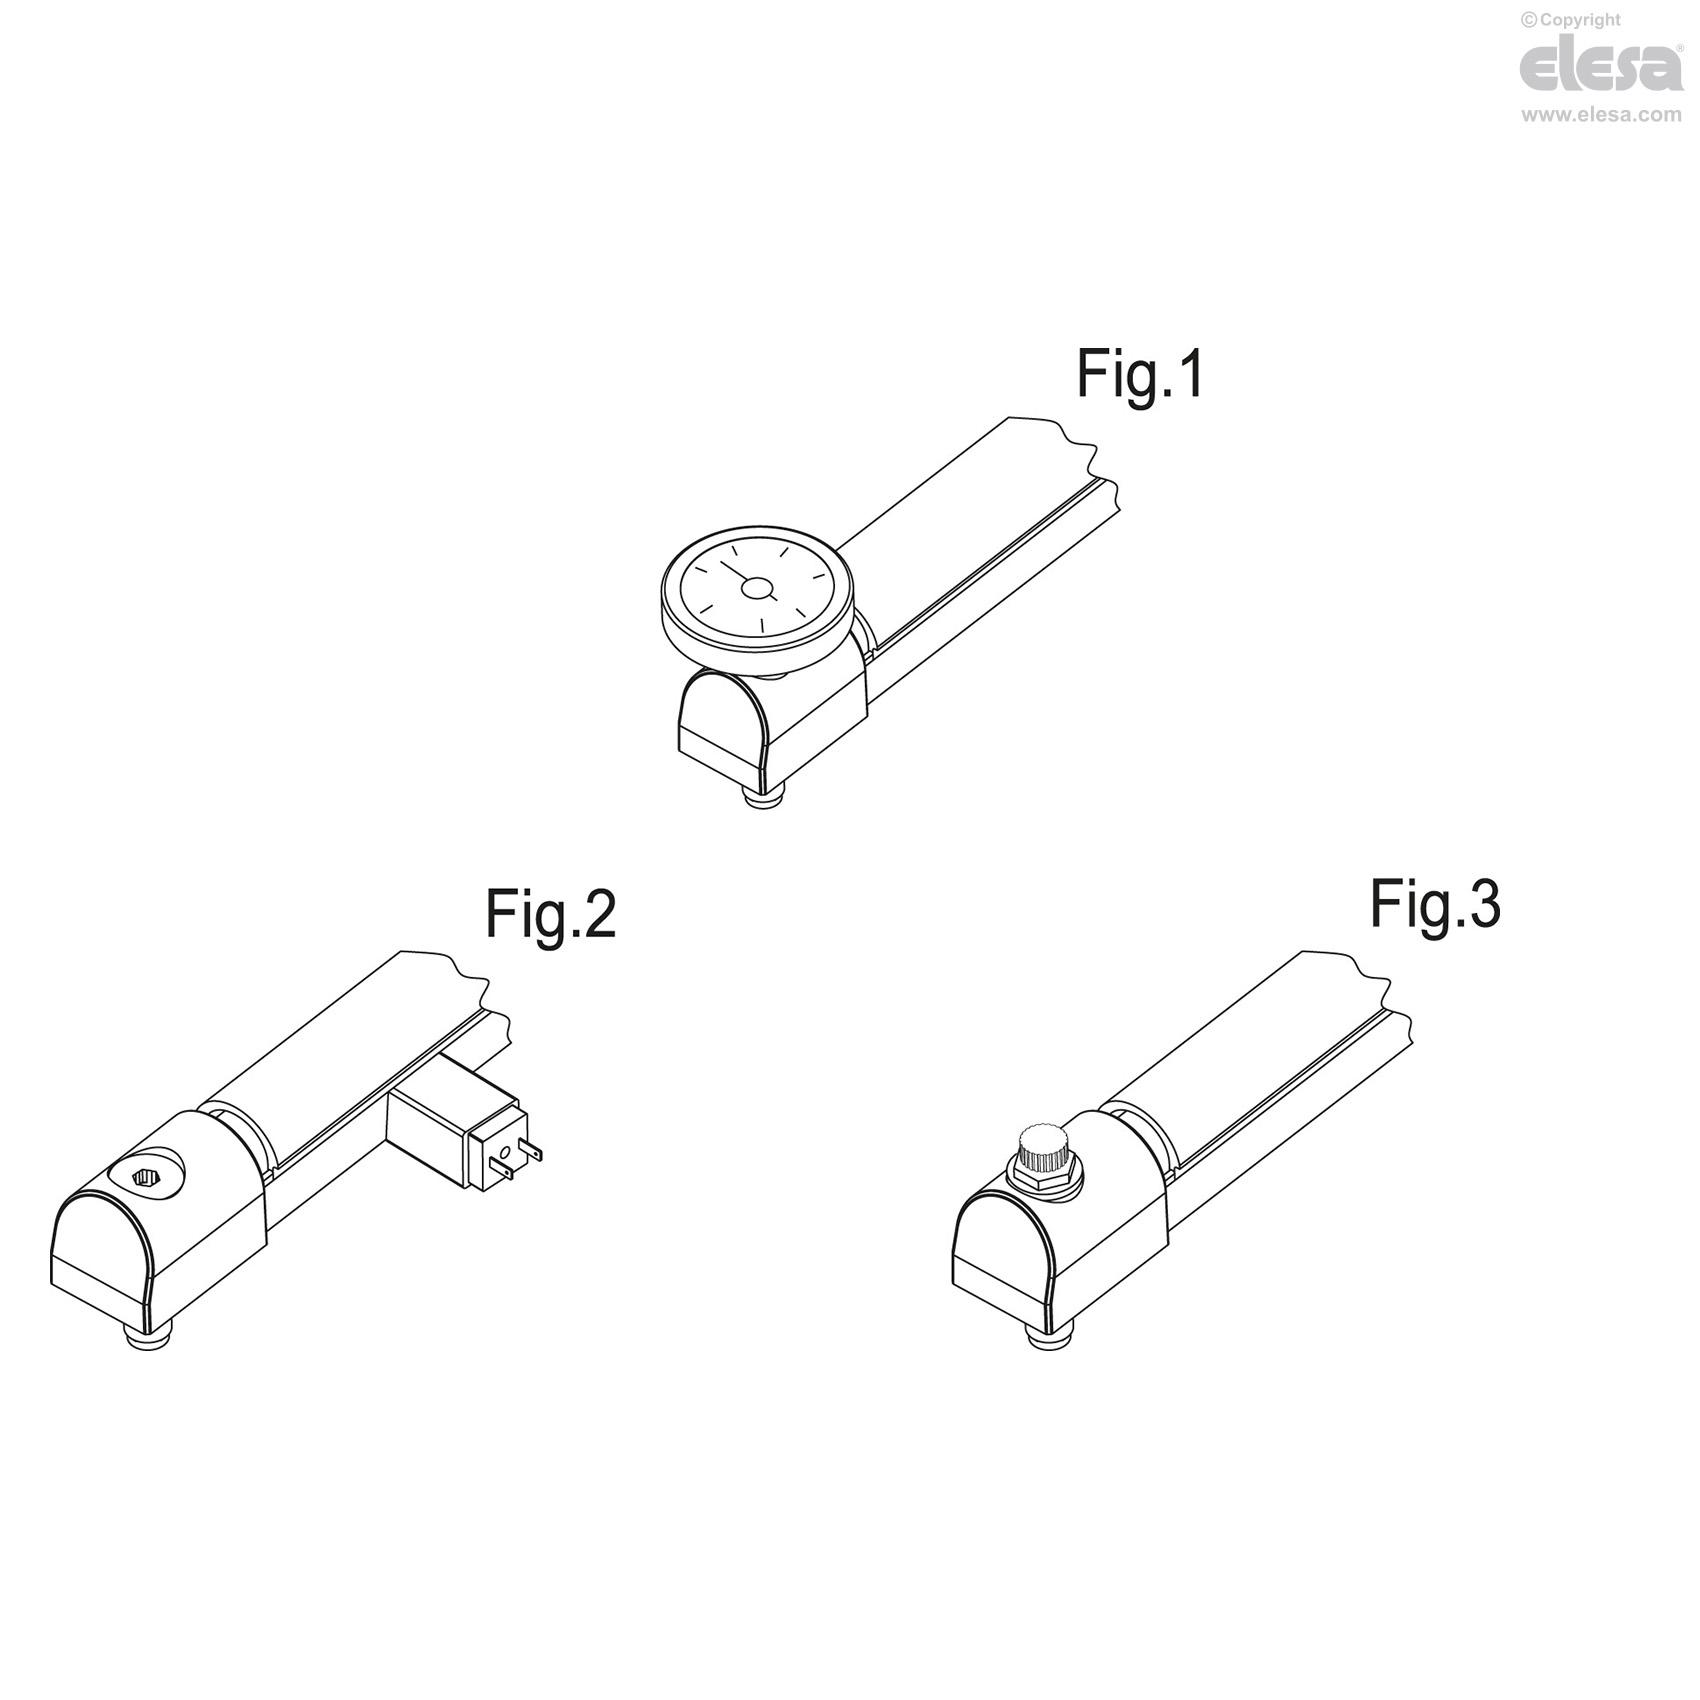 Elesa 111011-NP Column Level Indicators Without Transparent Front Protection Transparent Technopolymer Tube Aluminum Support Hck-Np Model 6.46 x 1.3 x 2.09